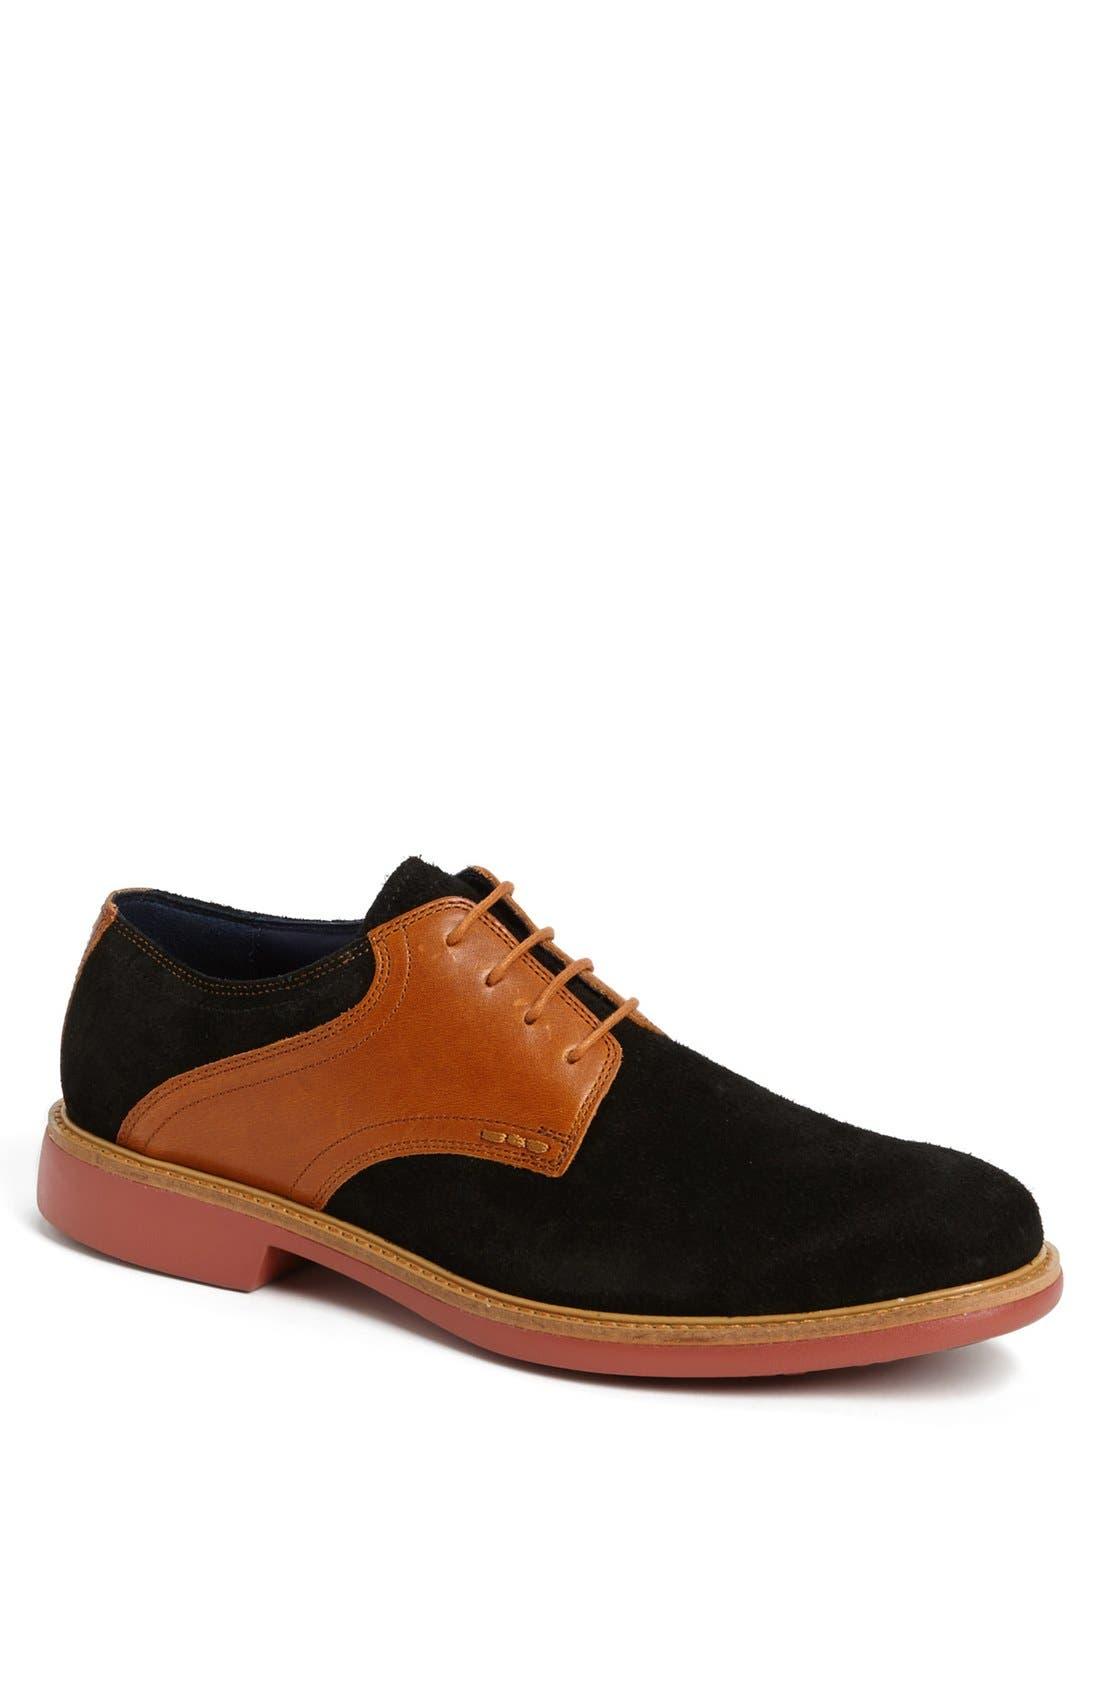 COLE HAAN 'Great Jones' Saddle Shoe, Main, color, 001